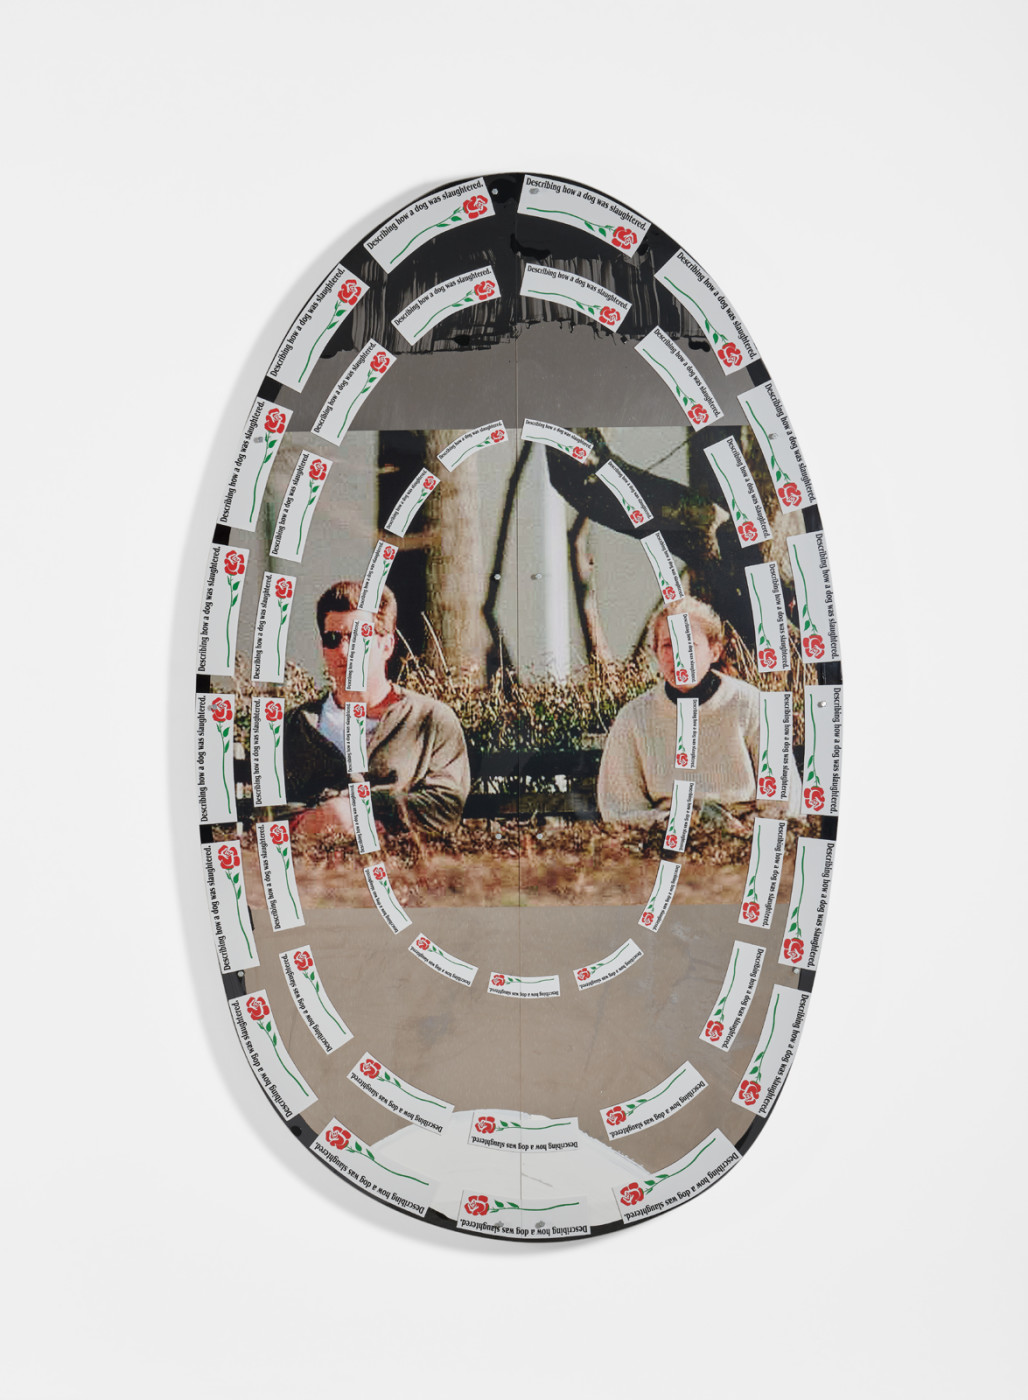 "<div class=""artwork_caption""><p><em>Untitled,</em> 2019<br />adhesive paint with gloss coat and enamel on aluminium panel, acrylic plexi<br />209.6 x 126.8 cm / 82 ½ x 49 ⅞ in</p></div>"